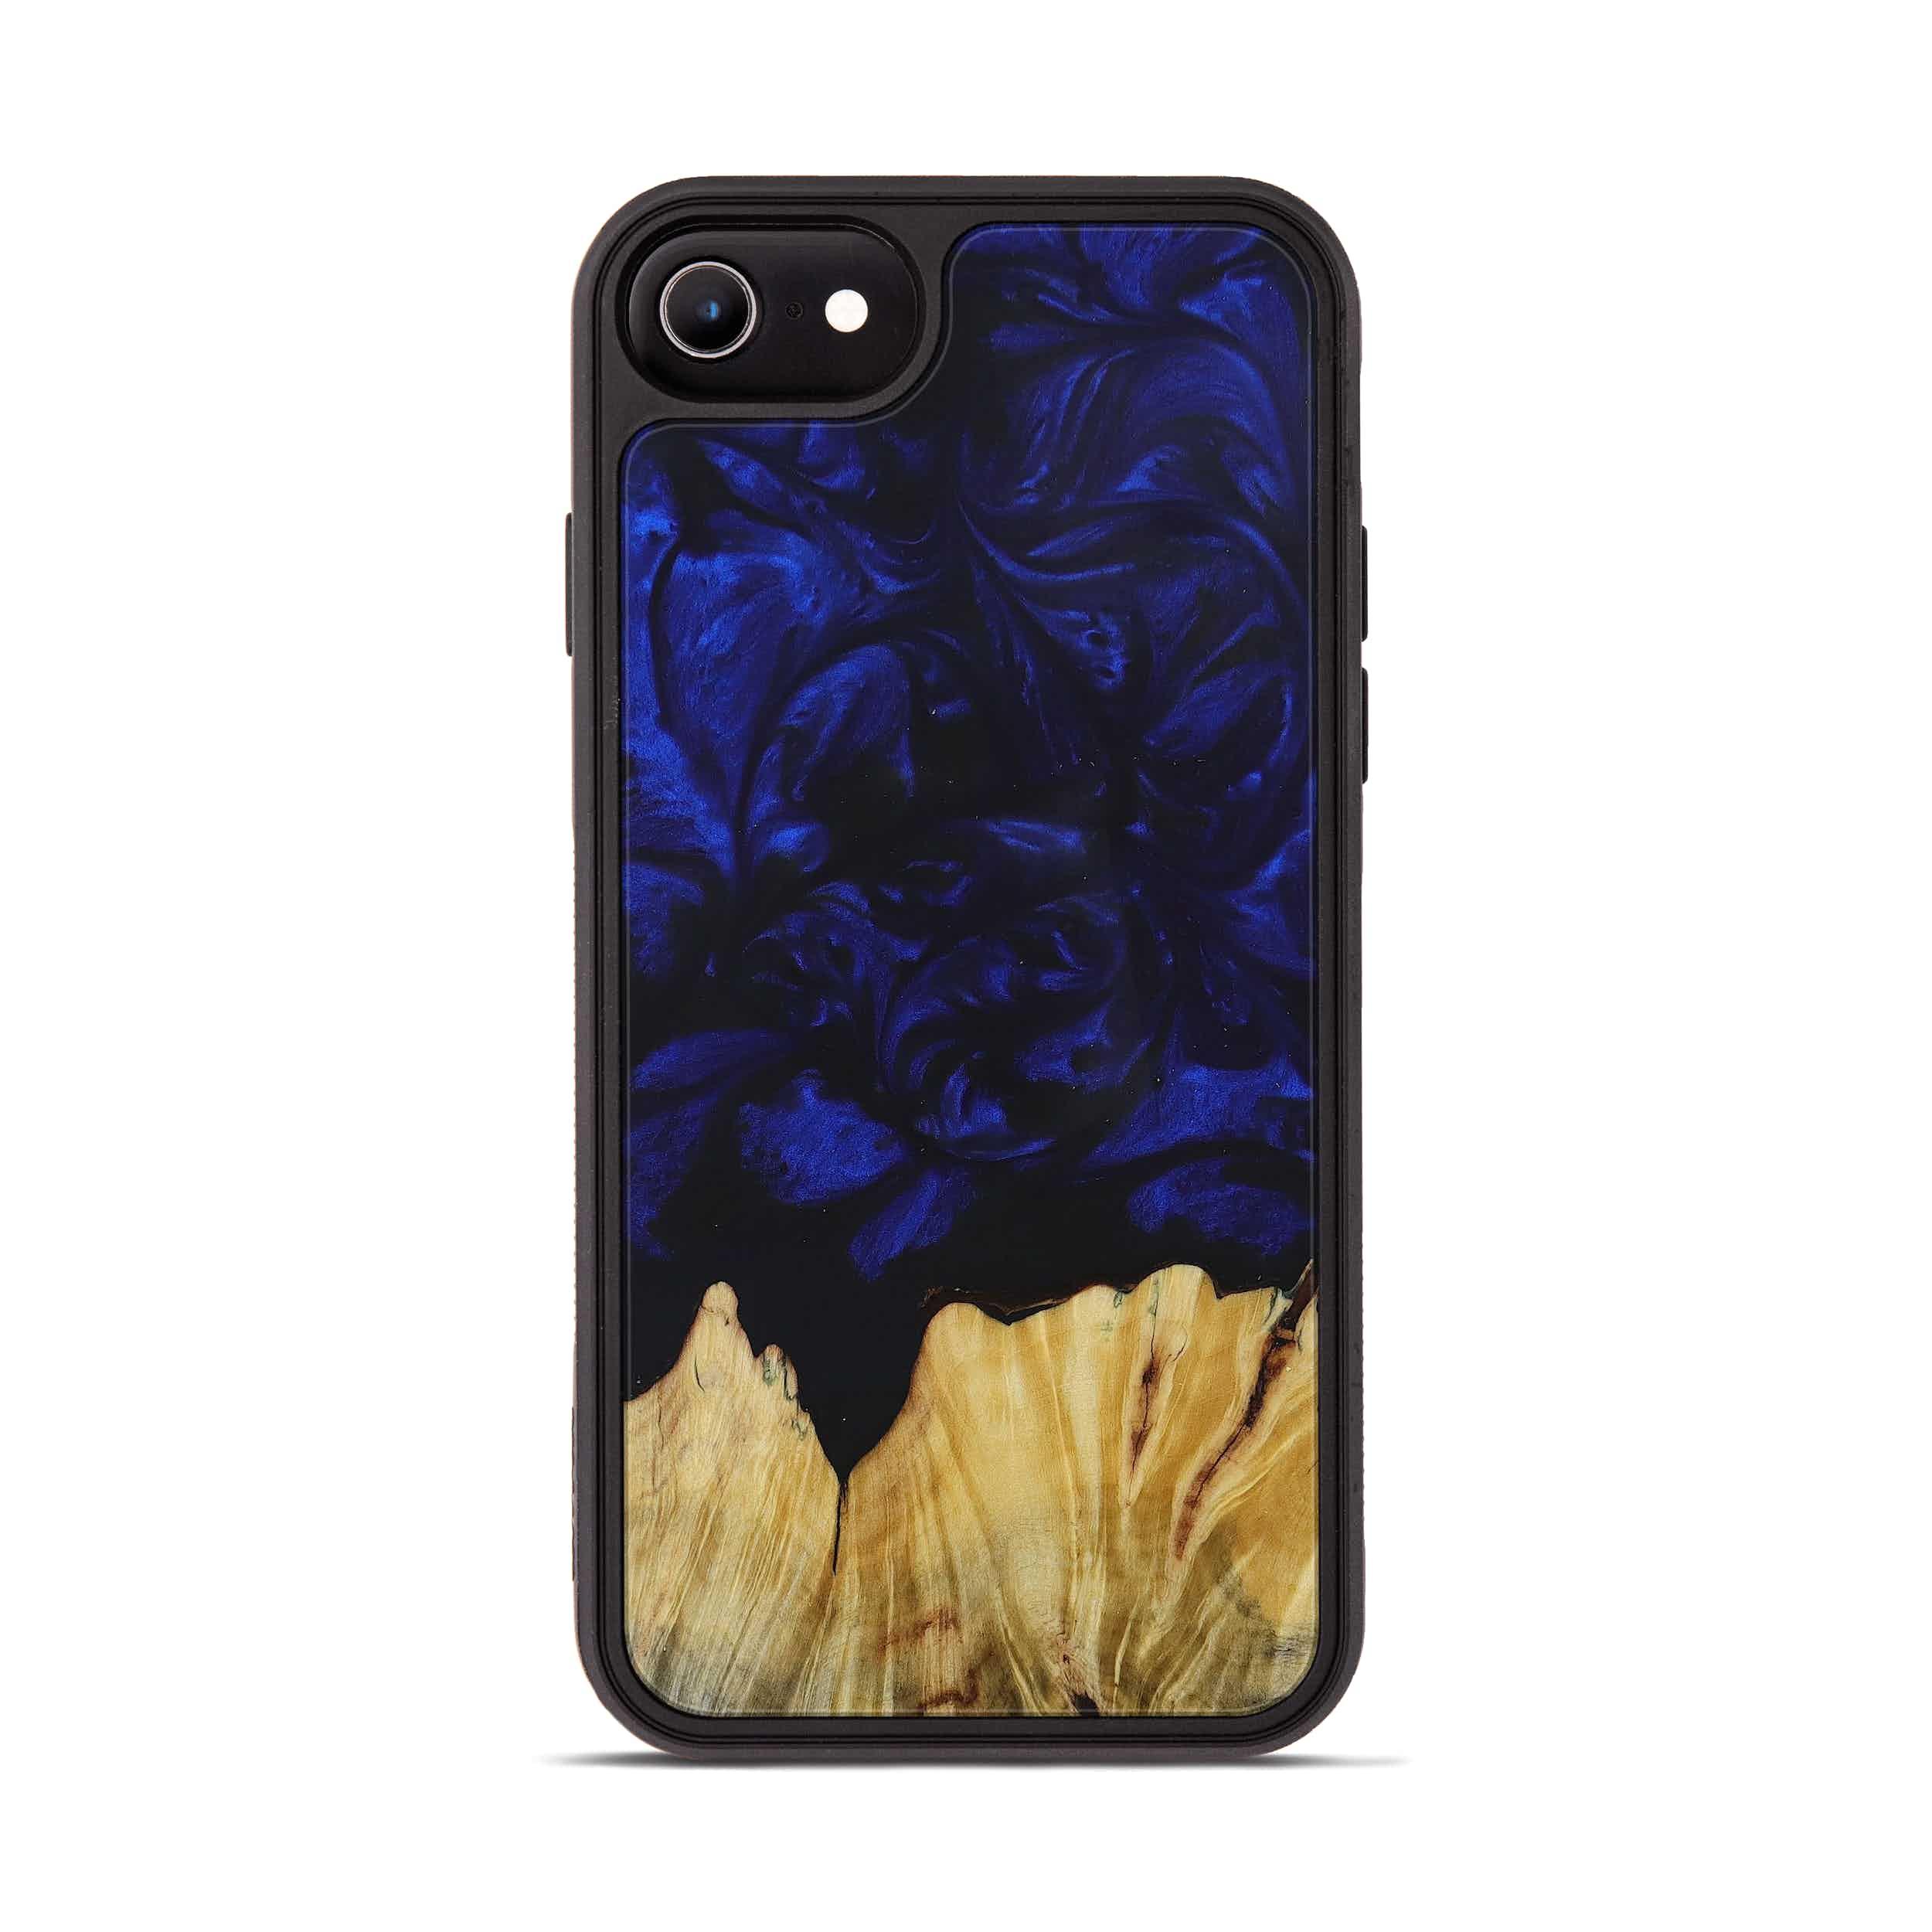 iPhone 8 Wood+Resin Phone Case - Jami (Dark Blue, 394677)